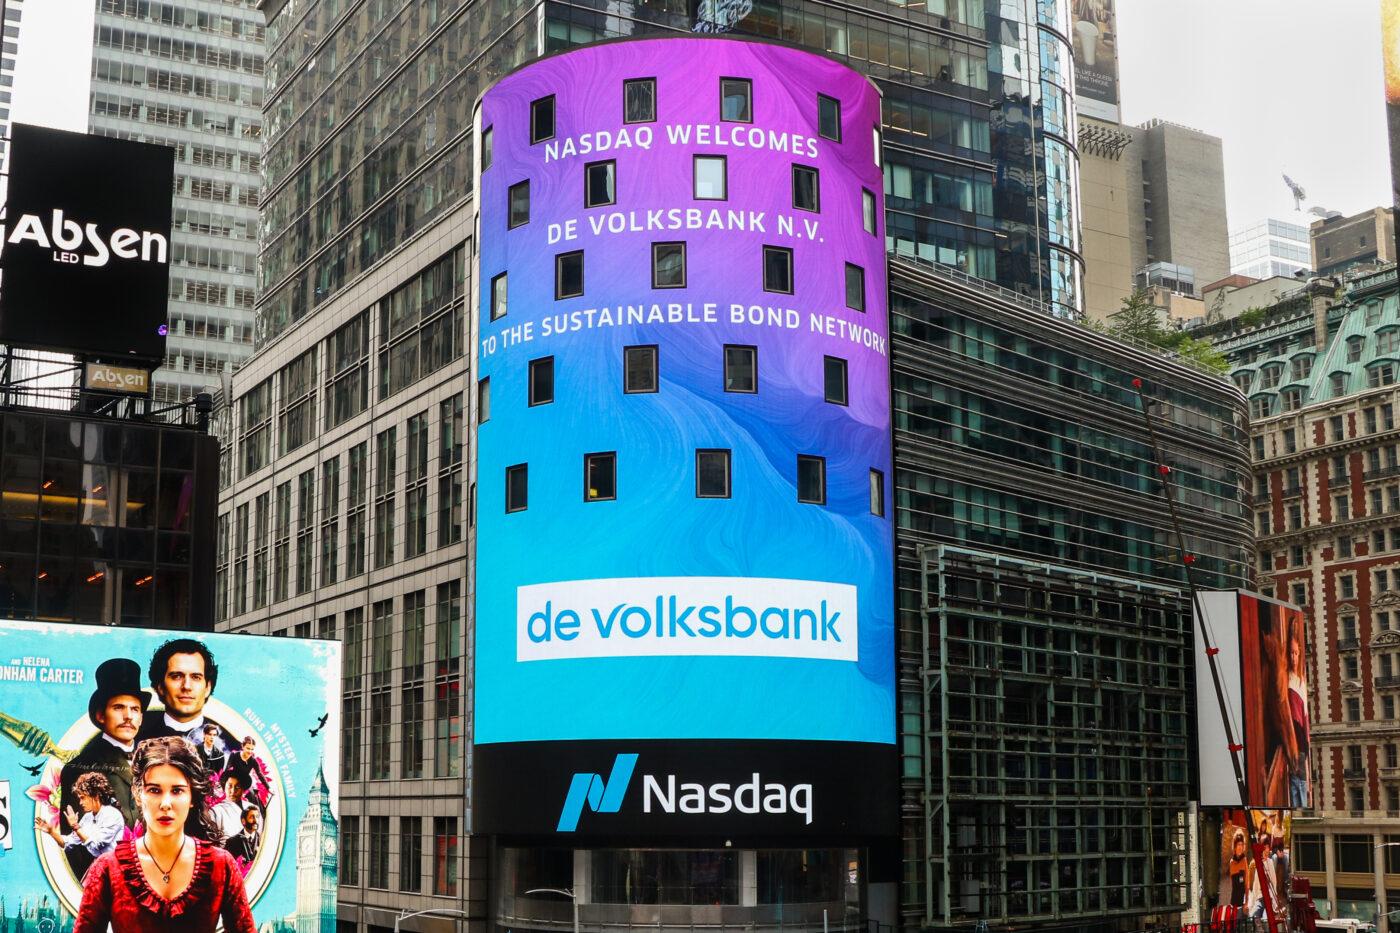 Devolksbank 20200914